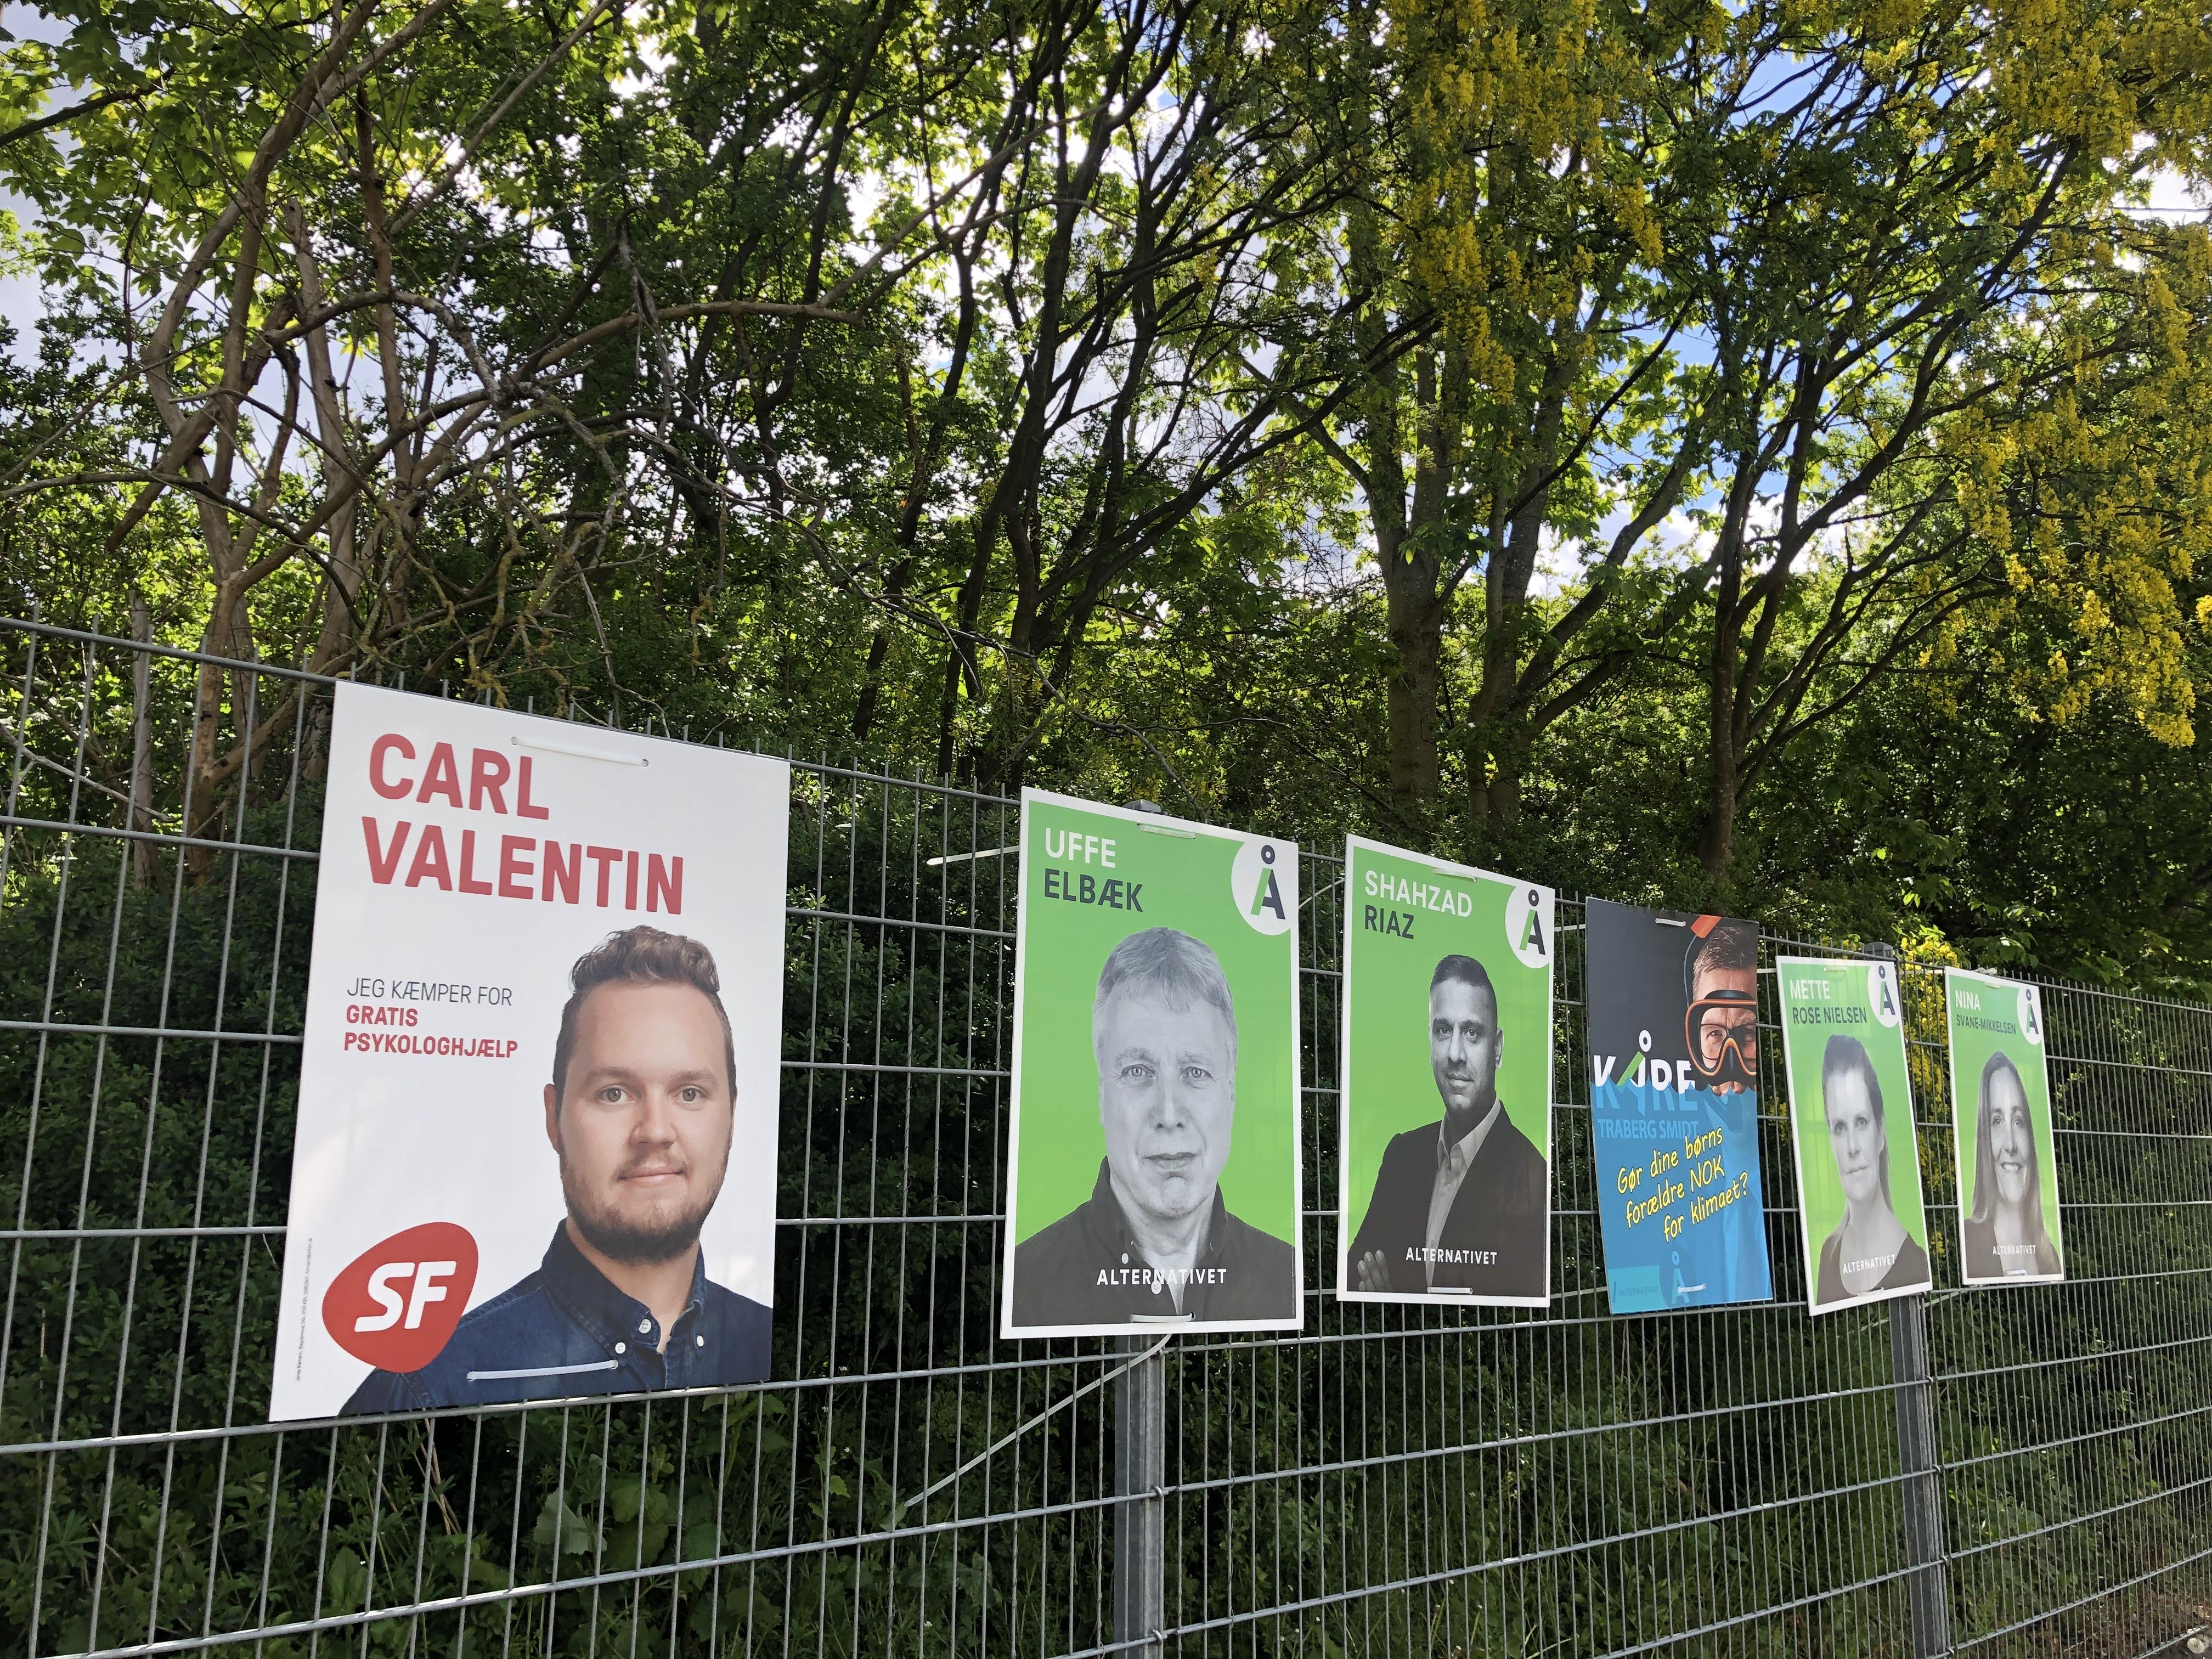 Valgplakater, valg, folketingsvalg, folketinget, politik, christiansborg